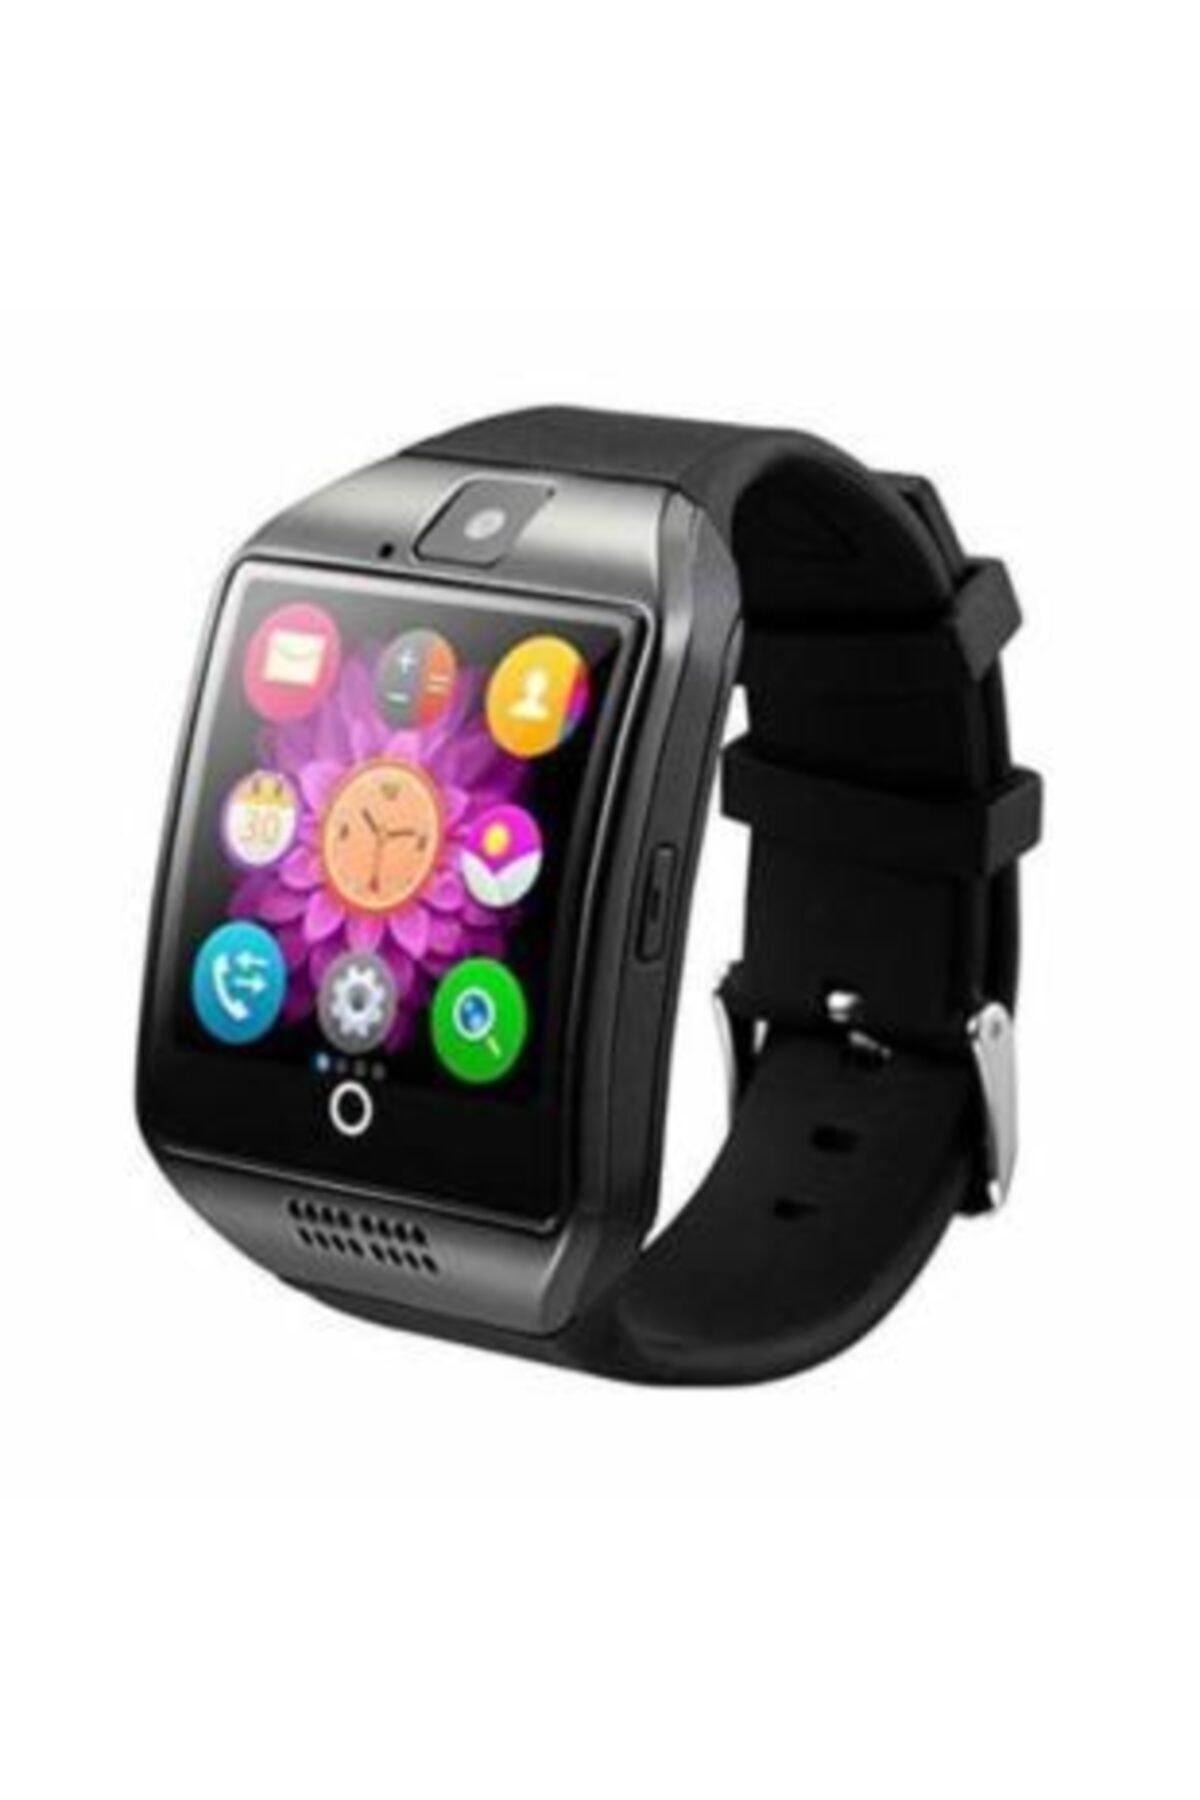 Z6 Akıllı Saat Kameralı Konuşma Garantili Sim Kartlı Bluetooth